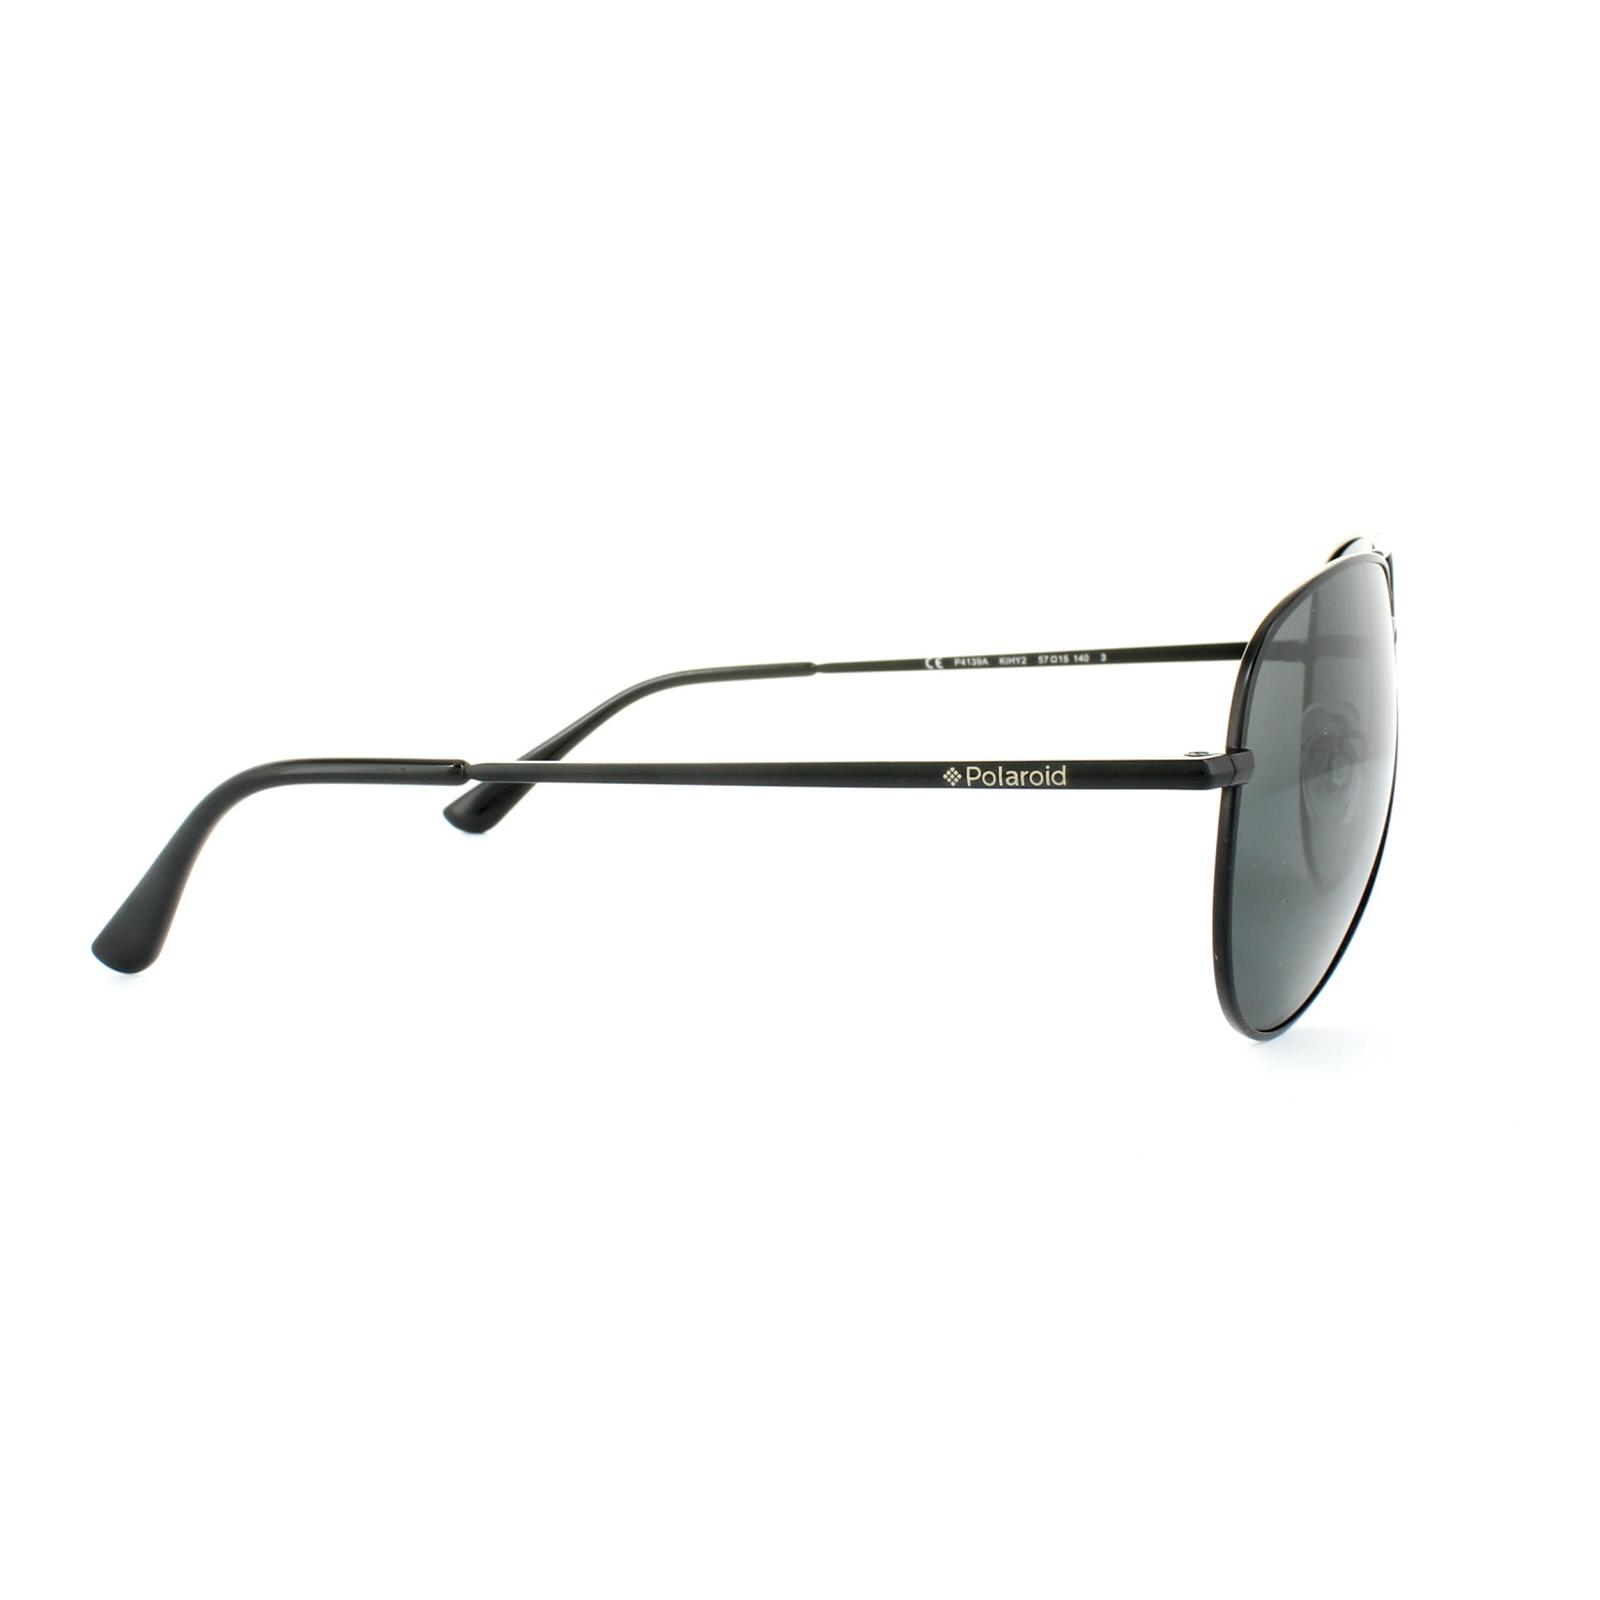 6046ee24a25c31 Cheap Polaroid P4139 Sunglasses - Discounted Sunglasses